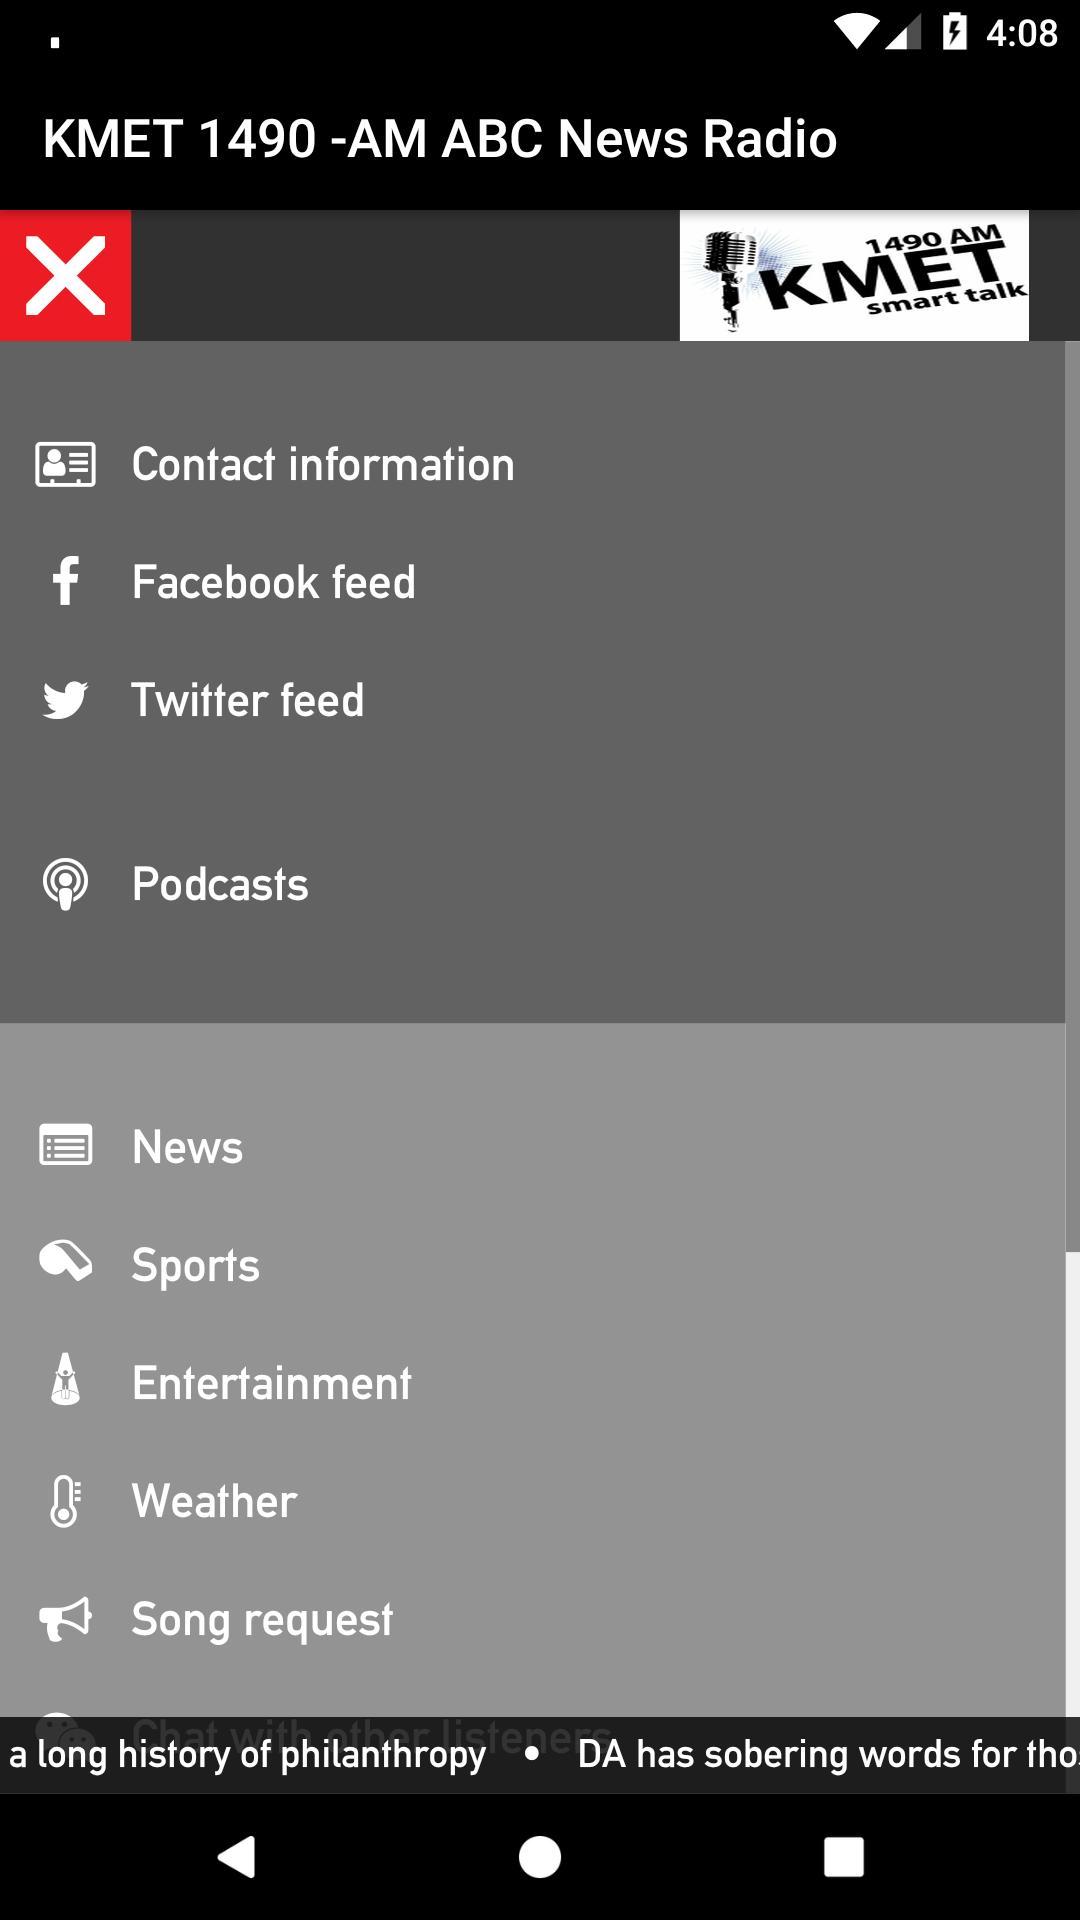 KMET 1490 -AM ABC News Radio cho Android - Tải về APK